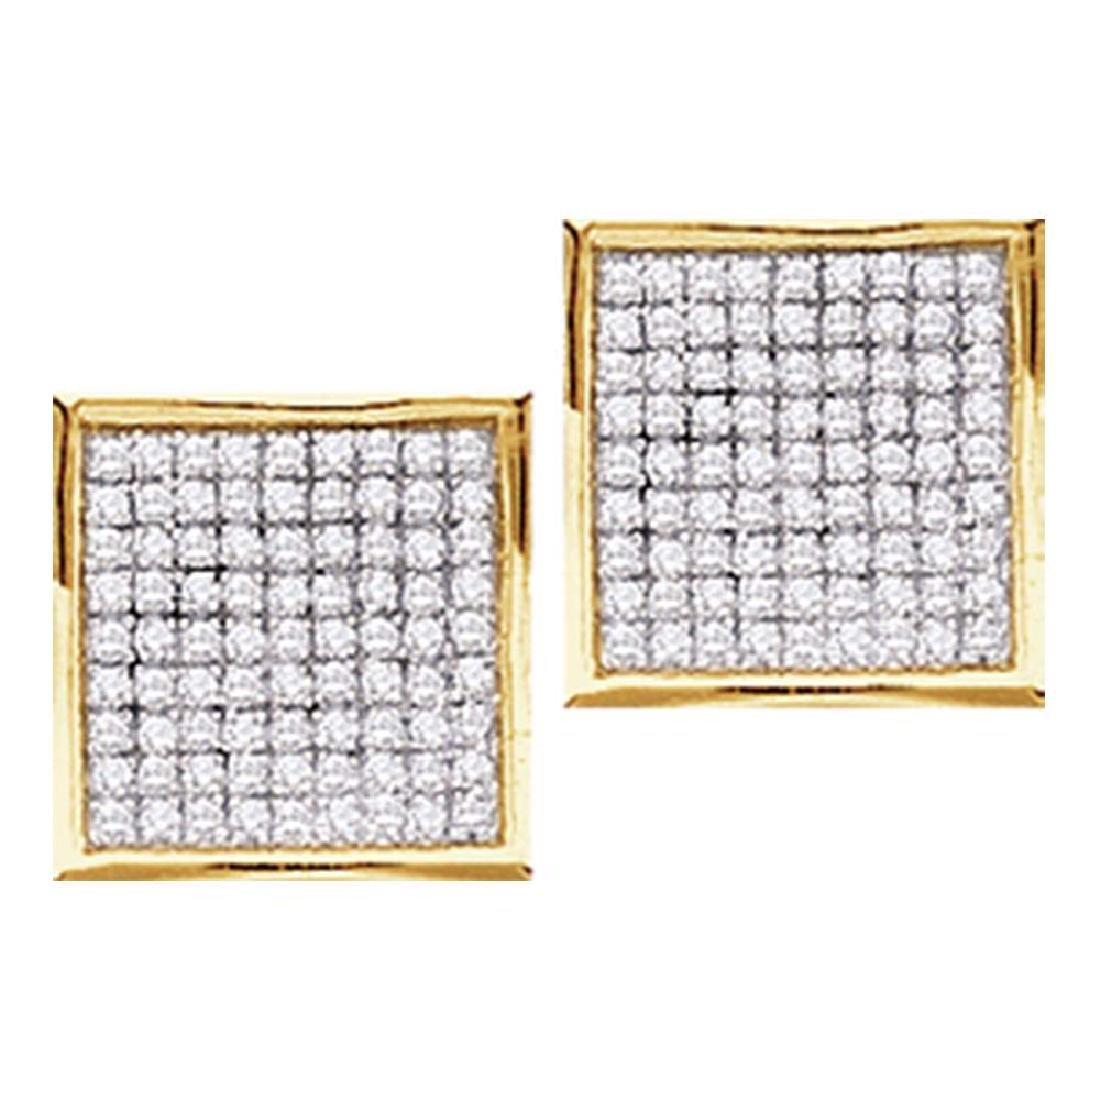 0.05 CTW Diamond Square Cluster Stud Earrings 10KT